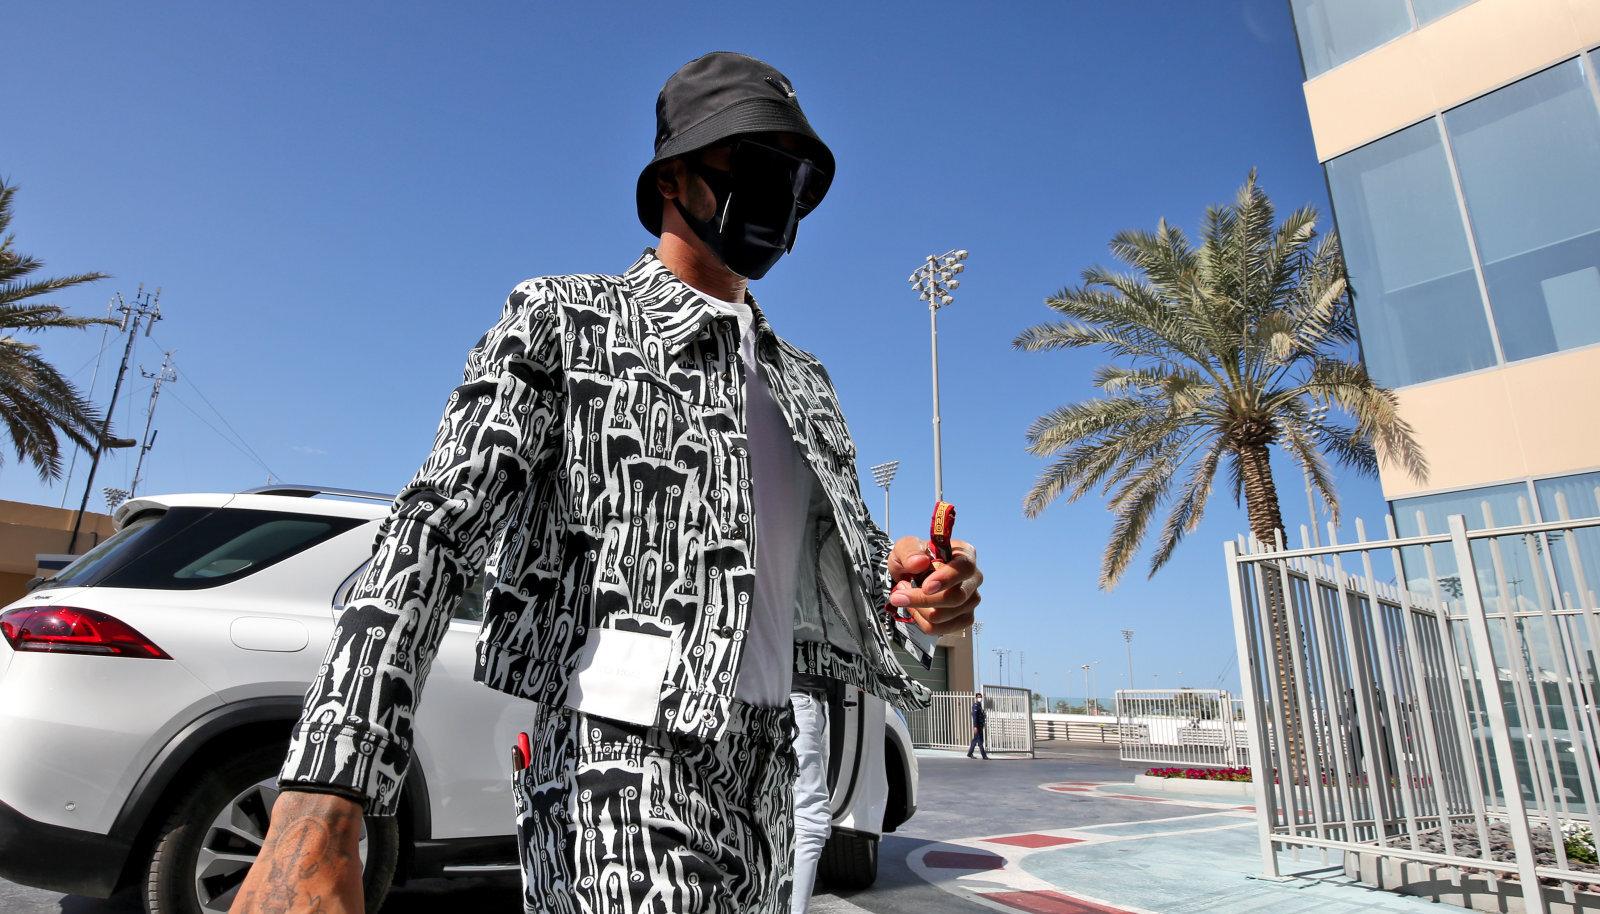 Lewis Hamilton reede hommikul Abu Dhabi ringrajale saabudes.